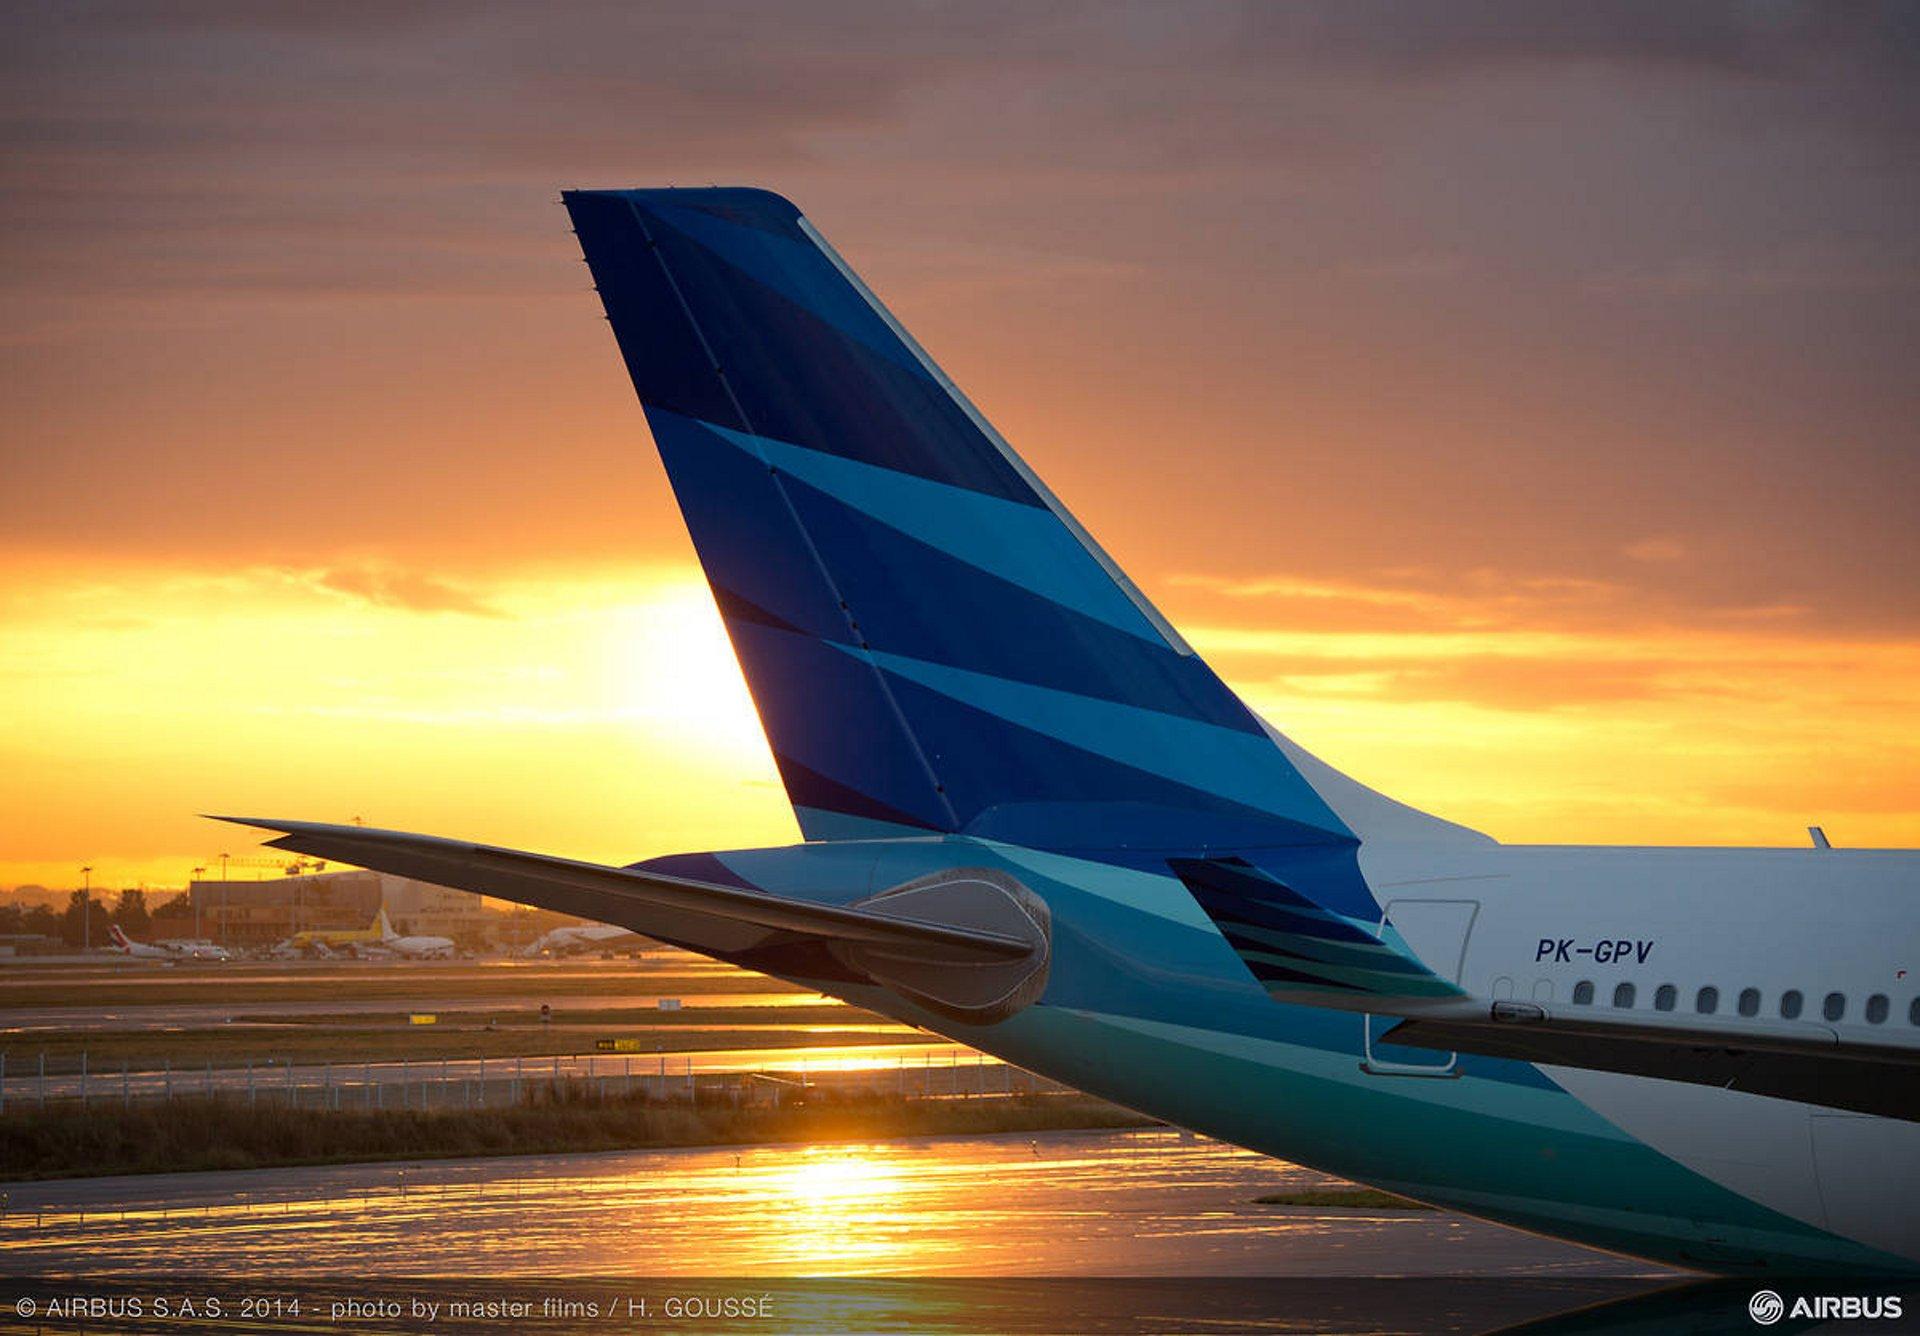 Aircraft Retirement